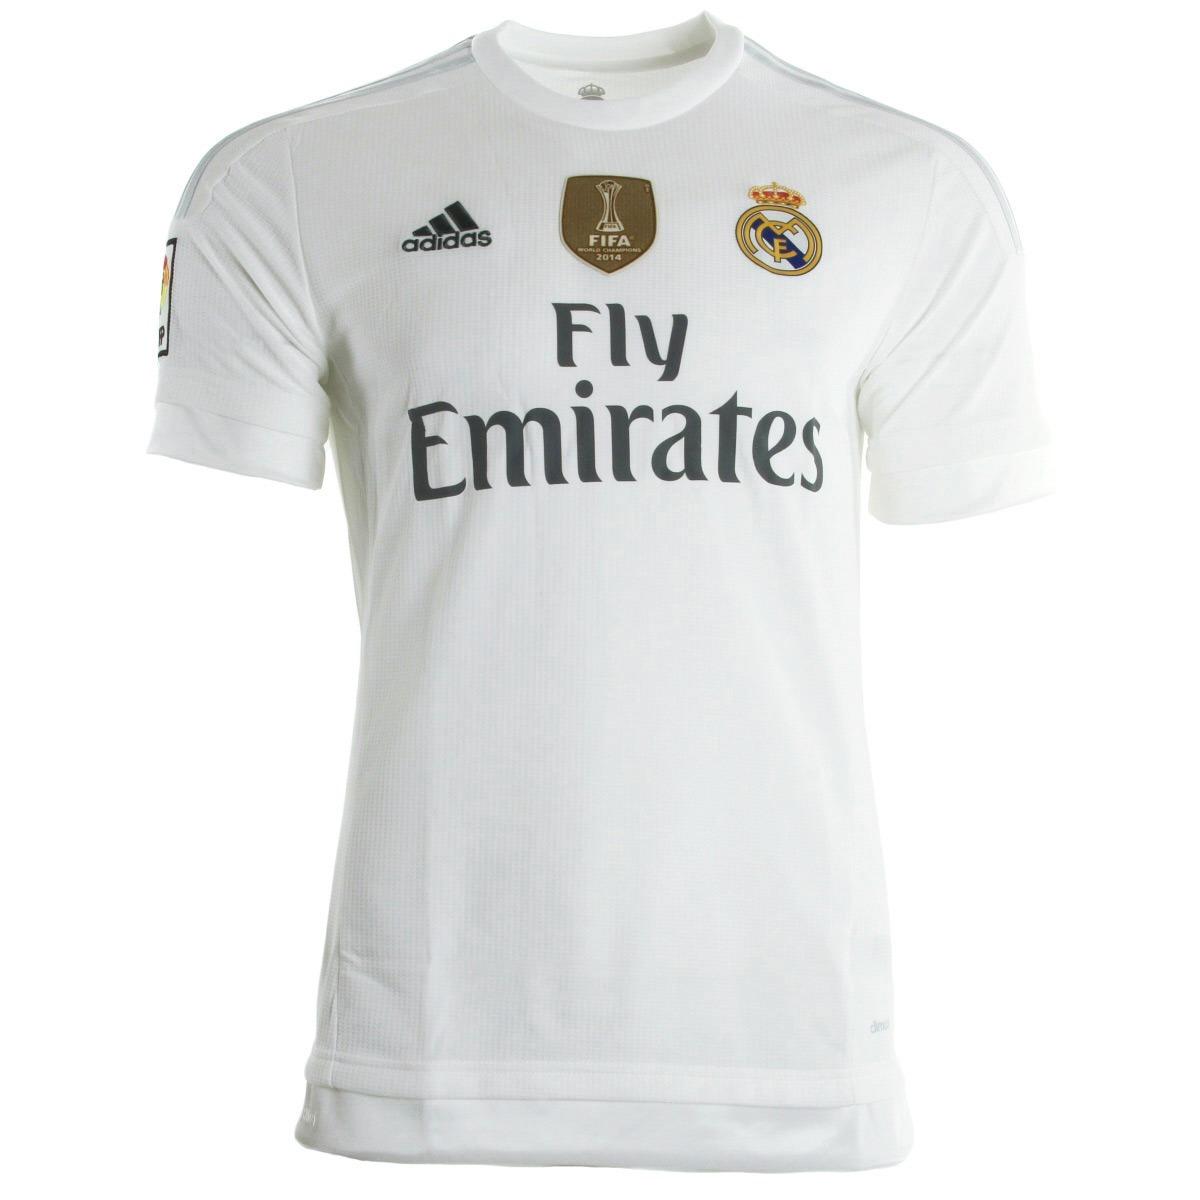 camiseta adidas real madrid temp 2016 futbol profesional. Cargando zoom. 0f552fabbe290